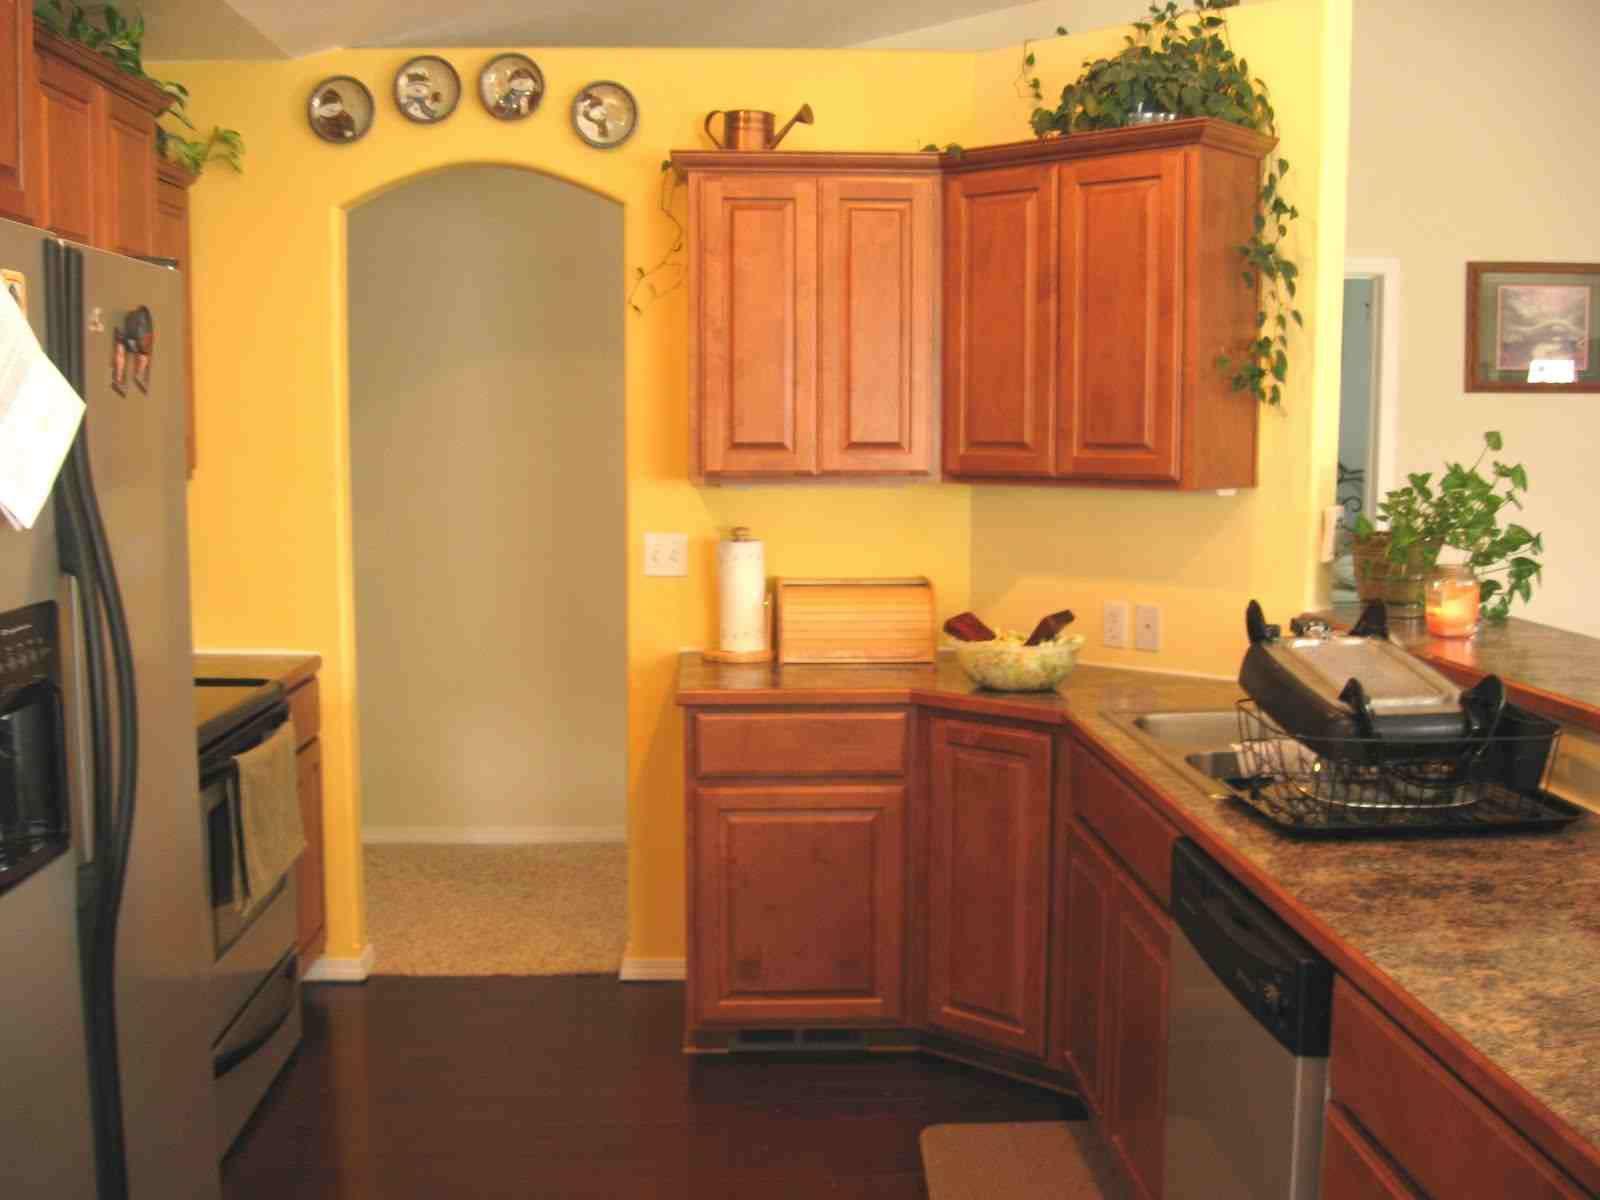 yellow kitchen kitchens pinterest on kitchen remodel yellow walls id=54689